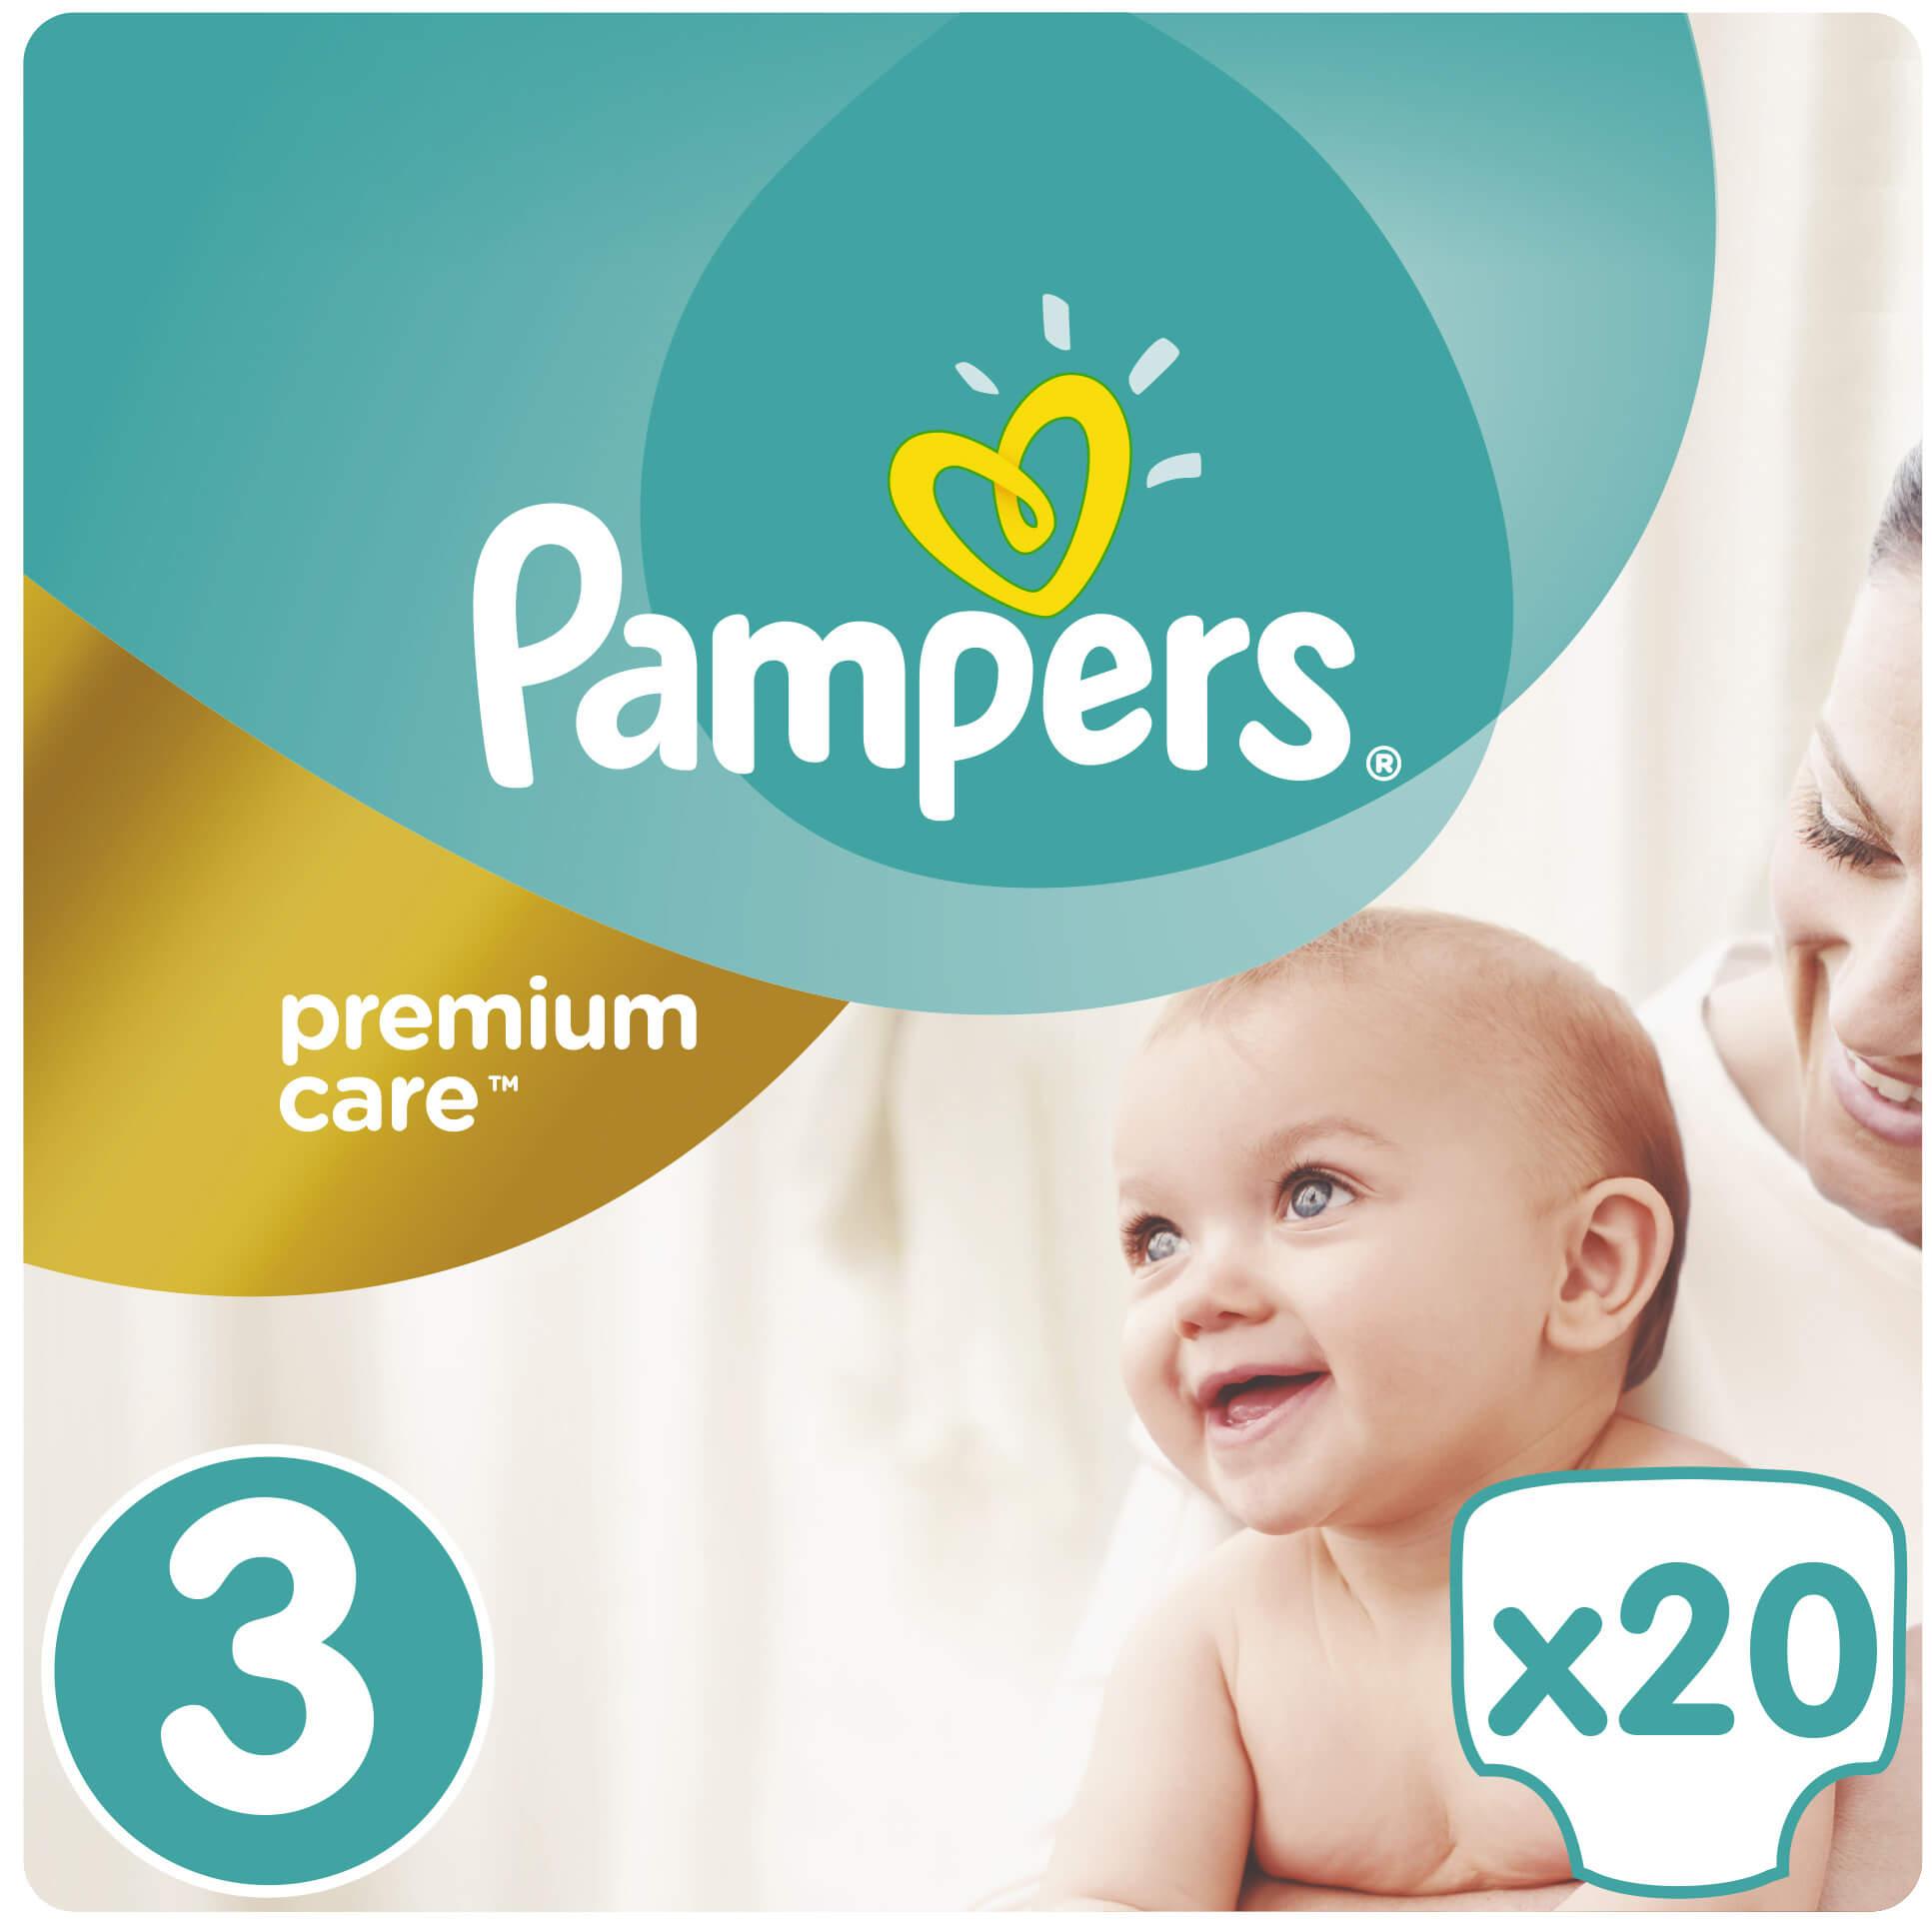 Pampers Premium Care No3 (5-9kg) 20 πάνες μητέρα παιδί   περιποίηση για το μωρό   πάνες για το μωρό